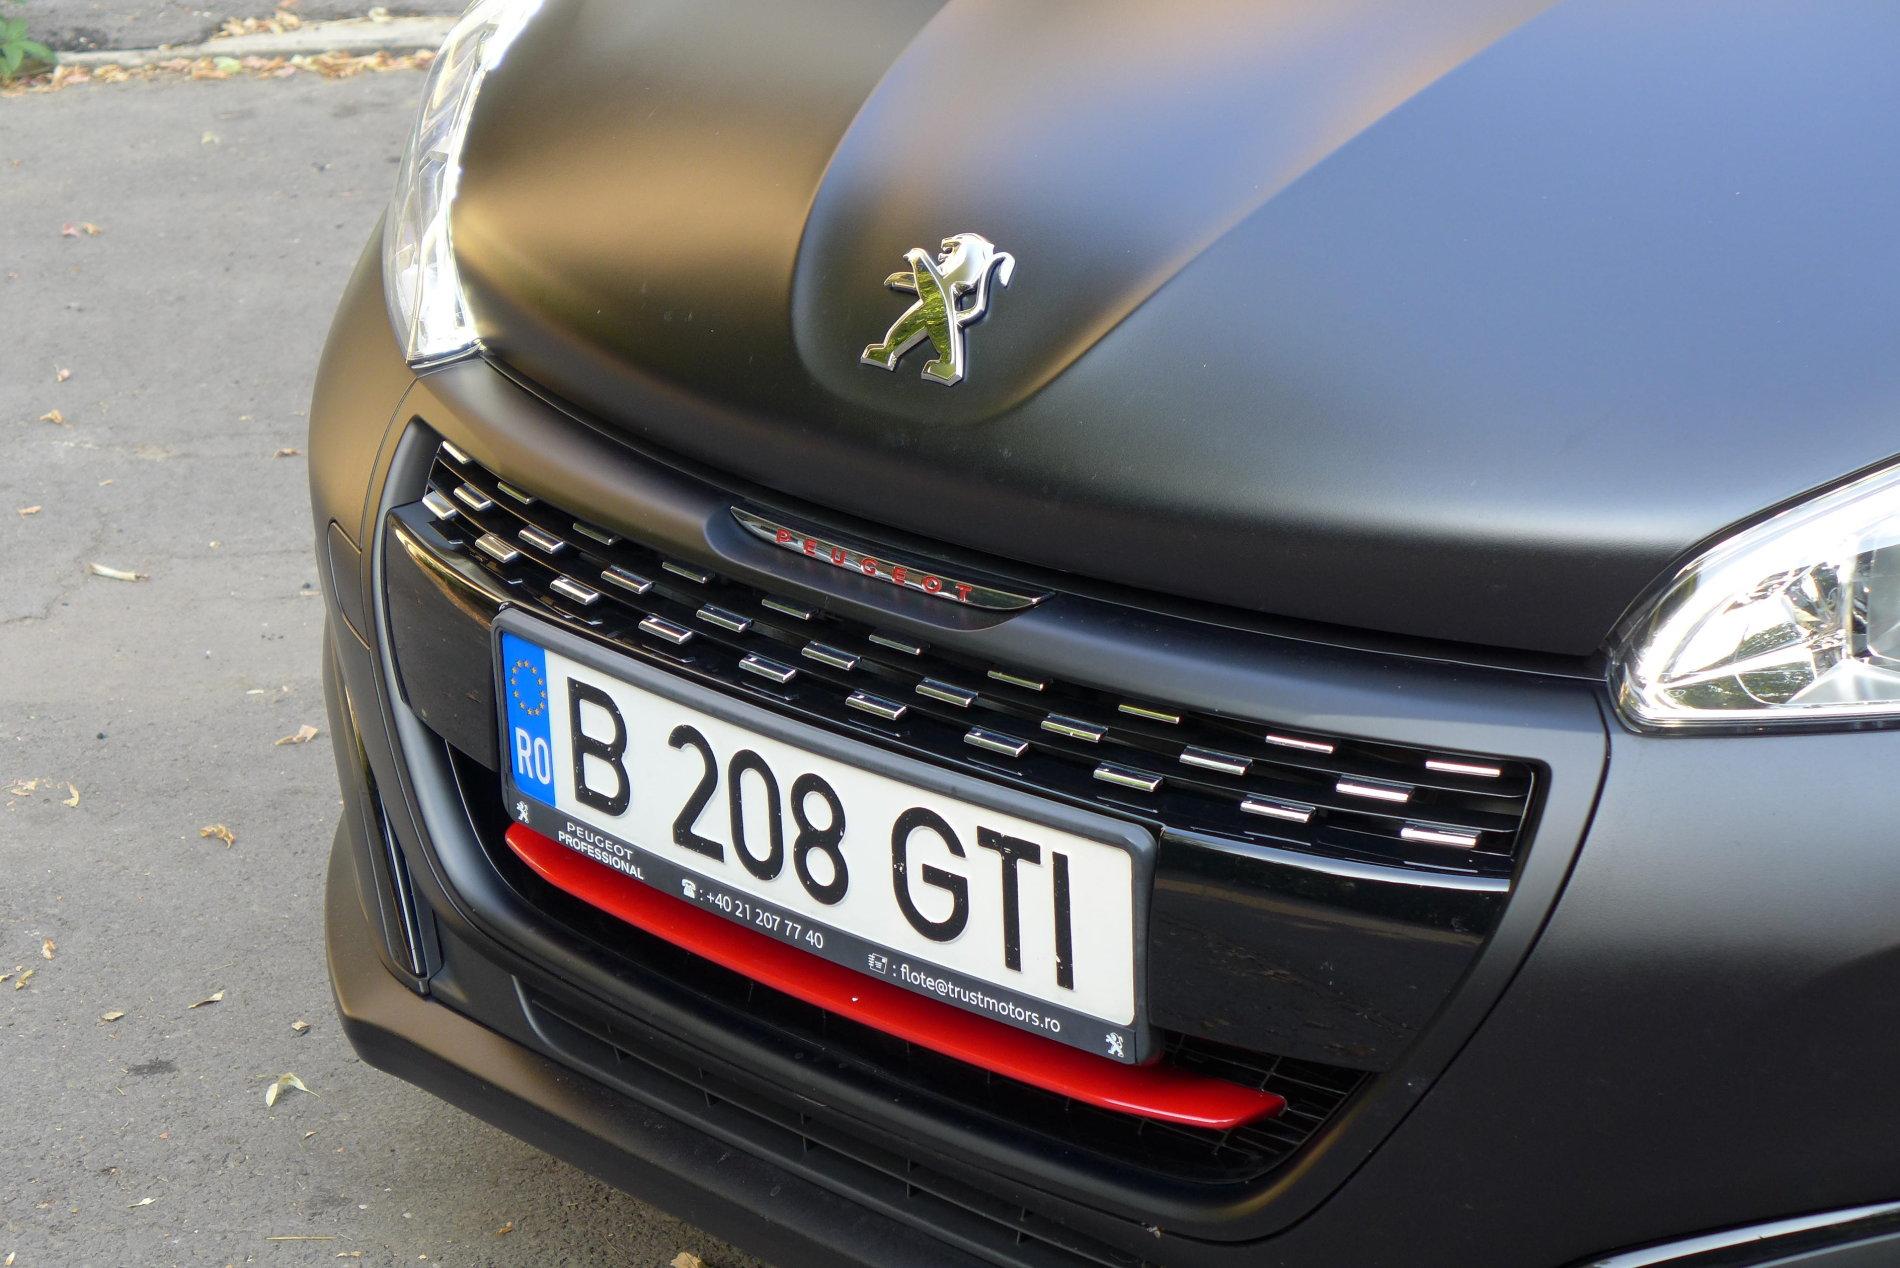 Peugeot 208 GTI - Peugeot 208 GTI